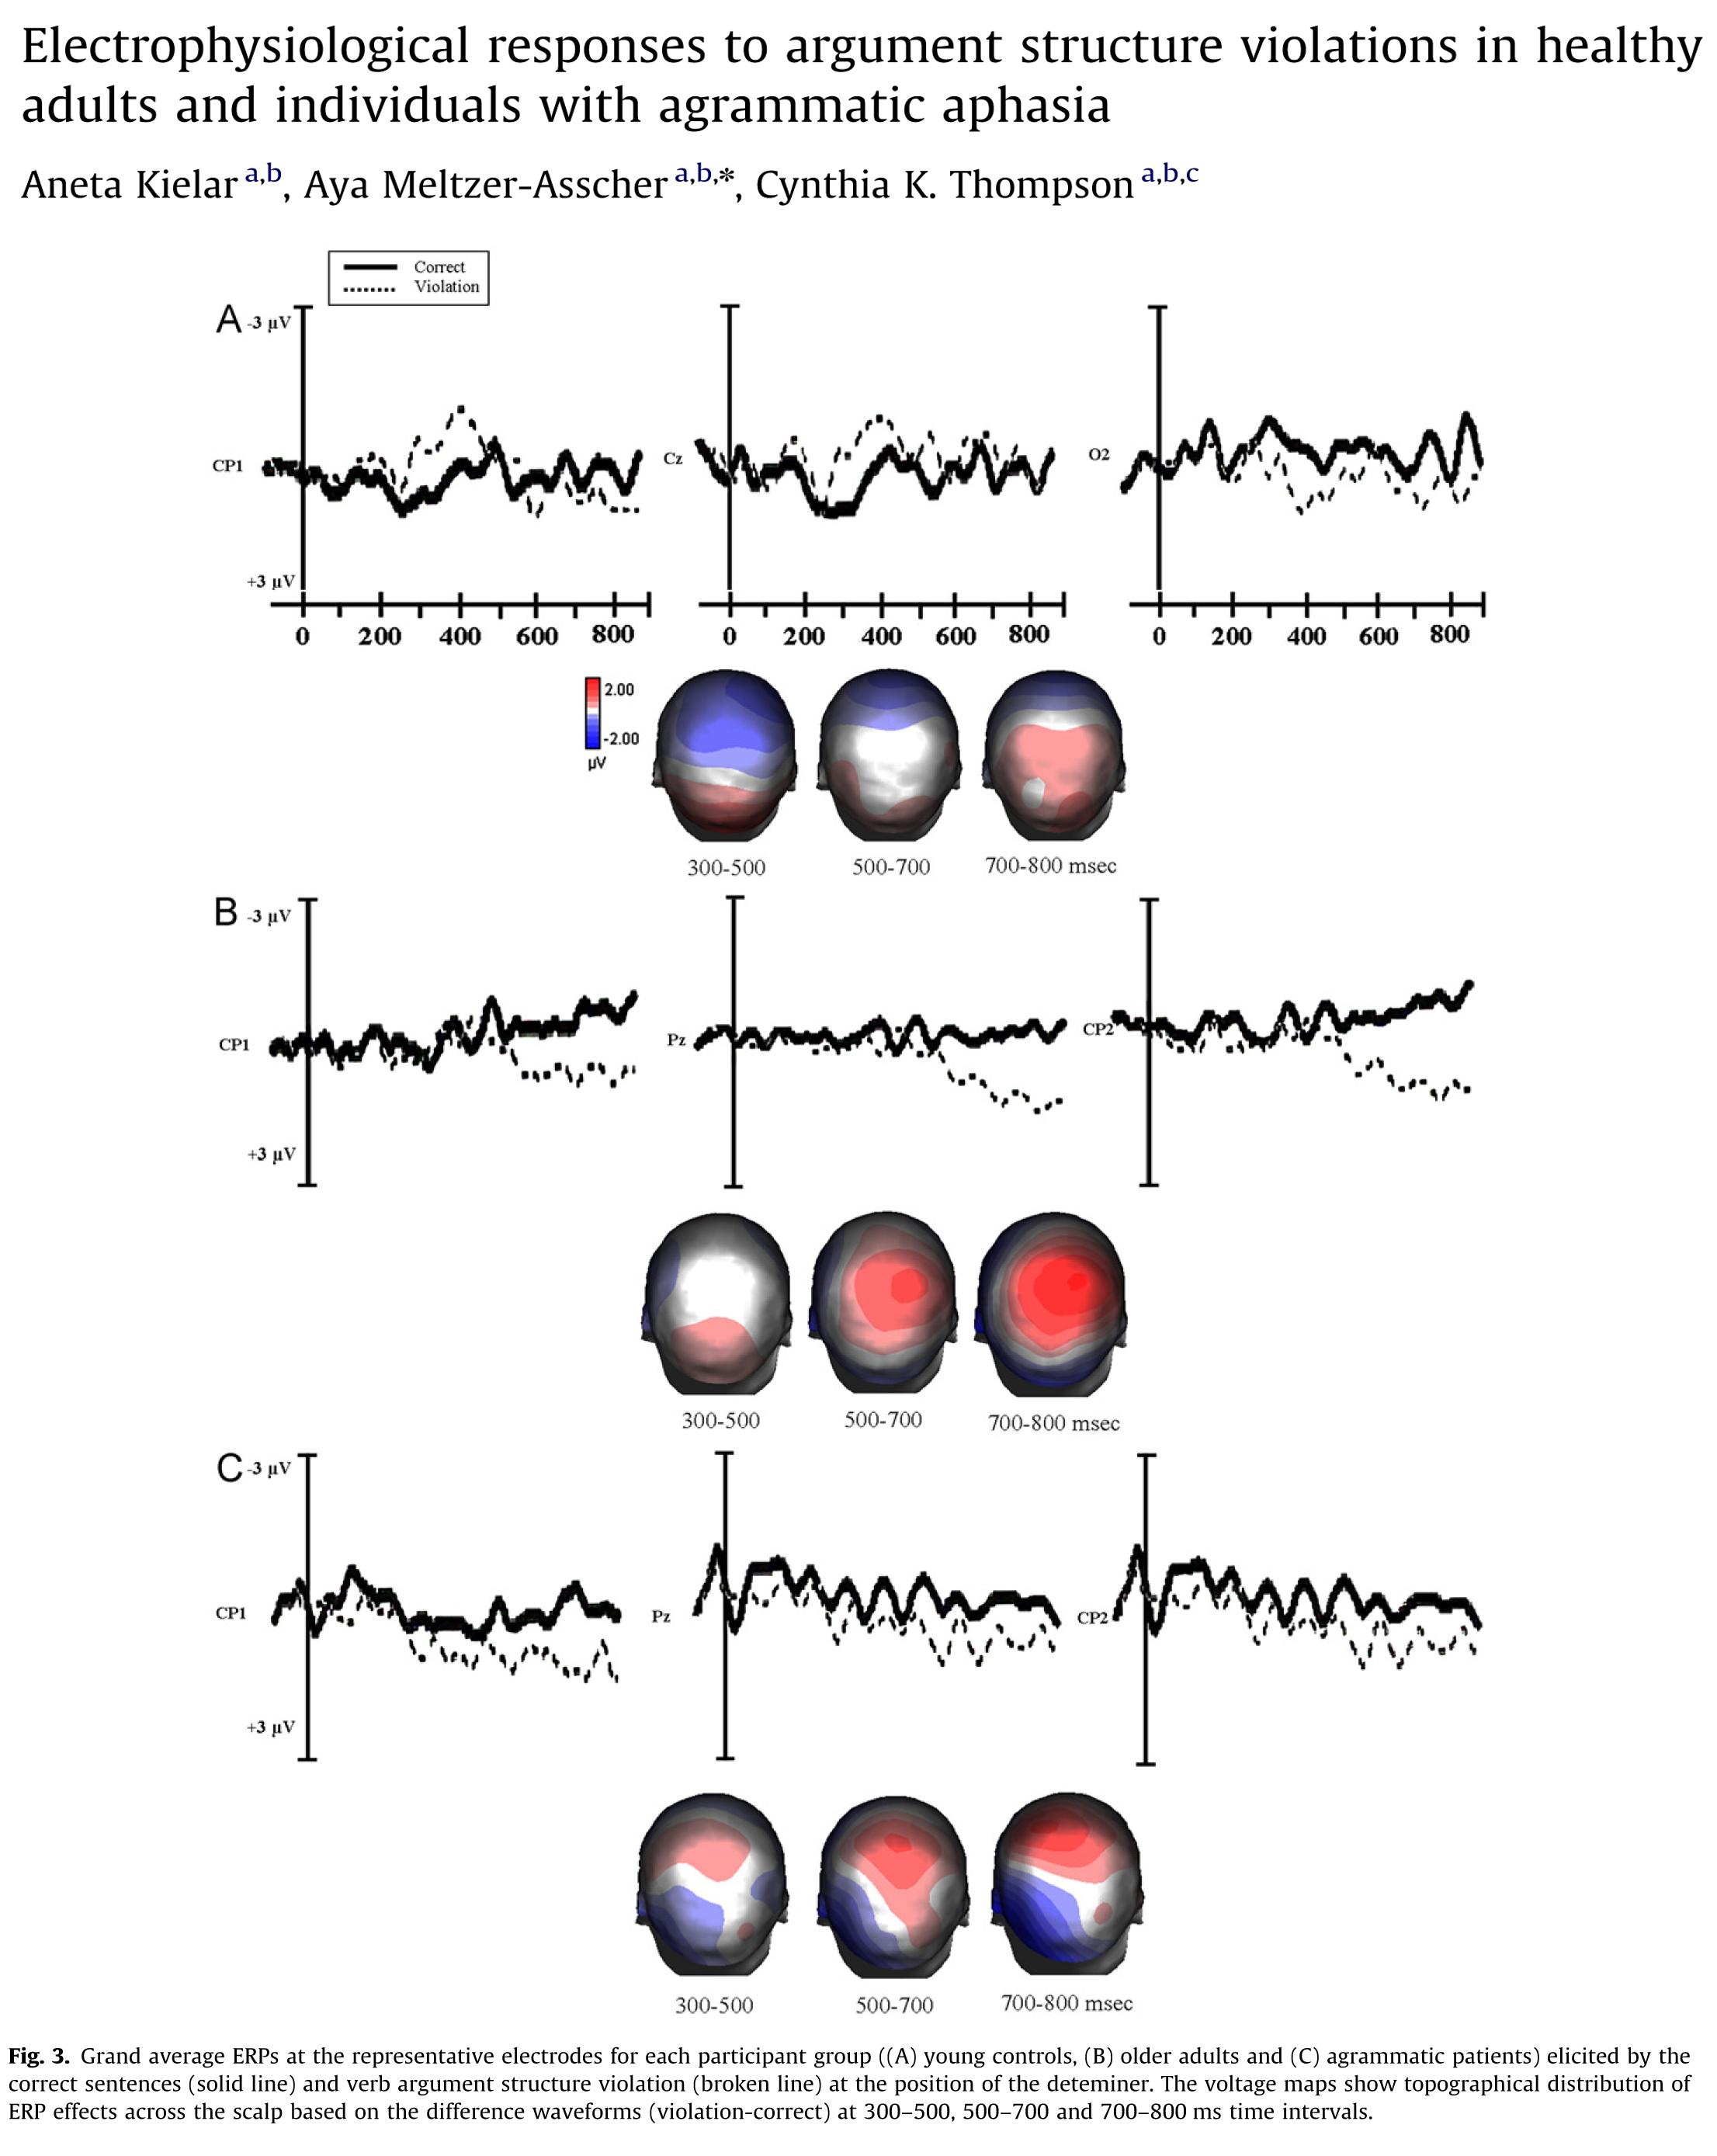 Neuropsychologia, 50 + (2012) 3320-3337. doi:10.1016/j.neuropsychologia.2012.09.013